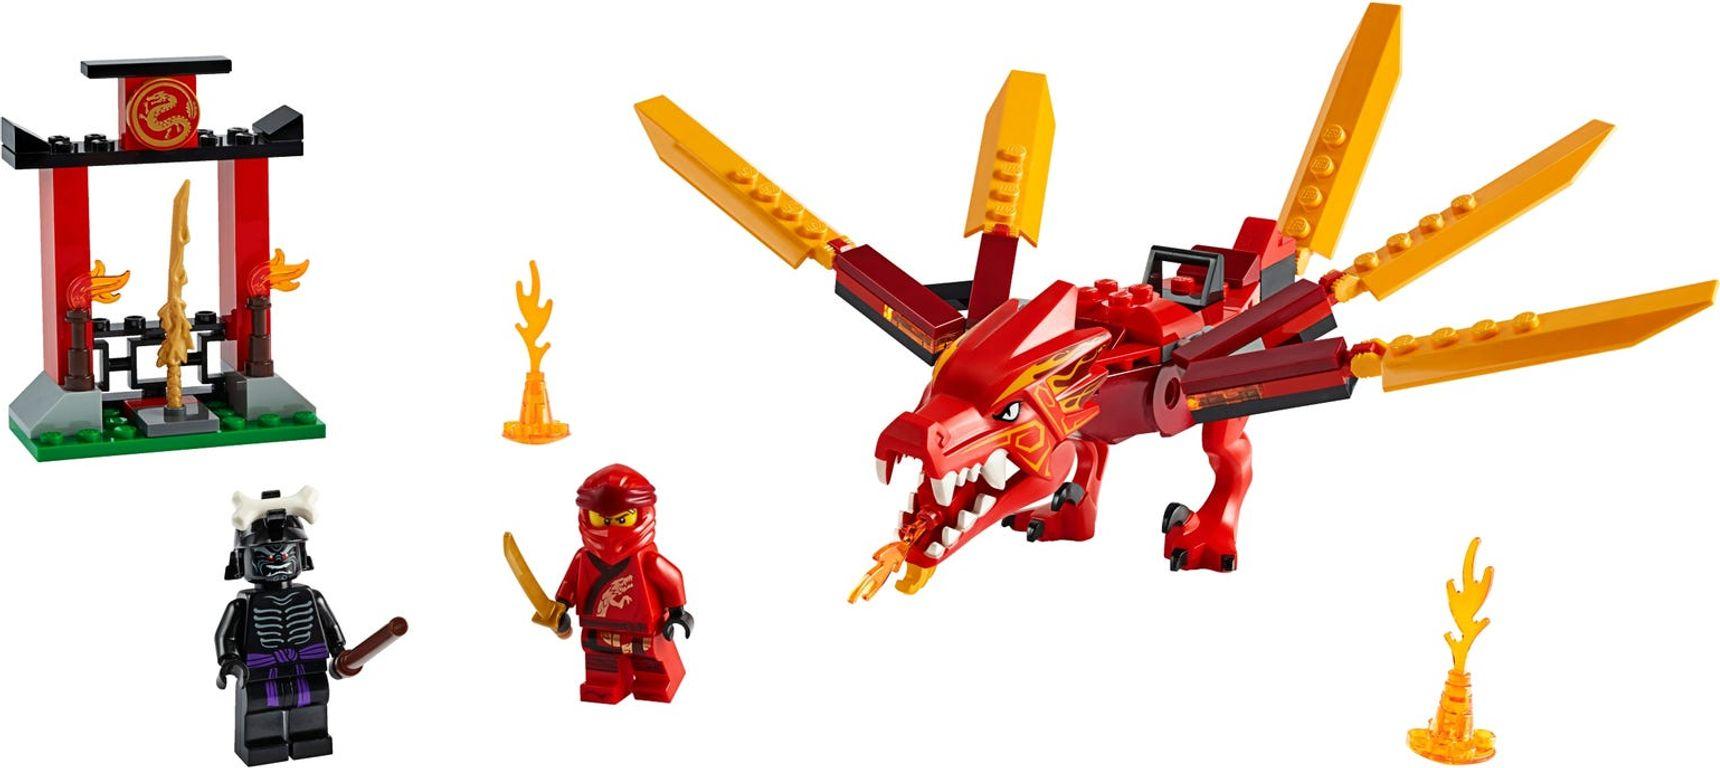 Kai's Fire Dragon components